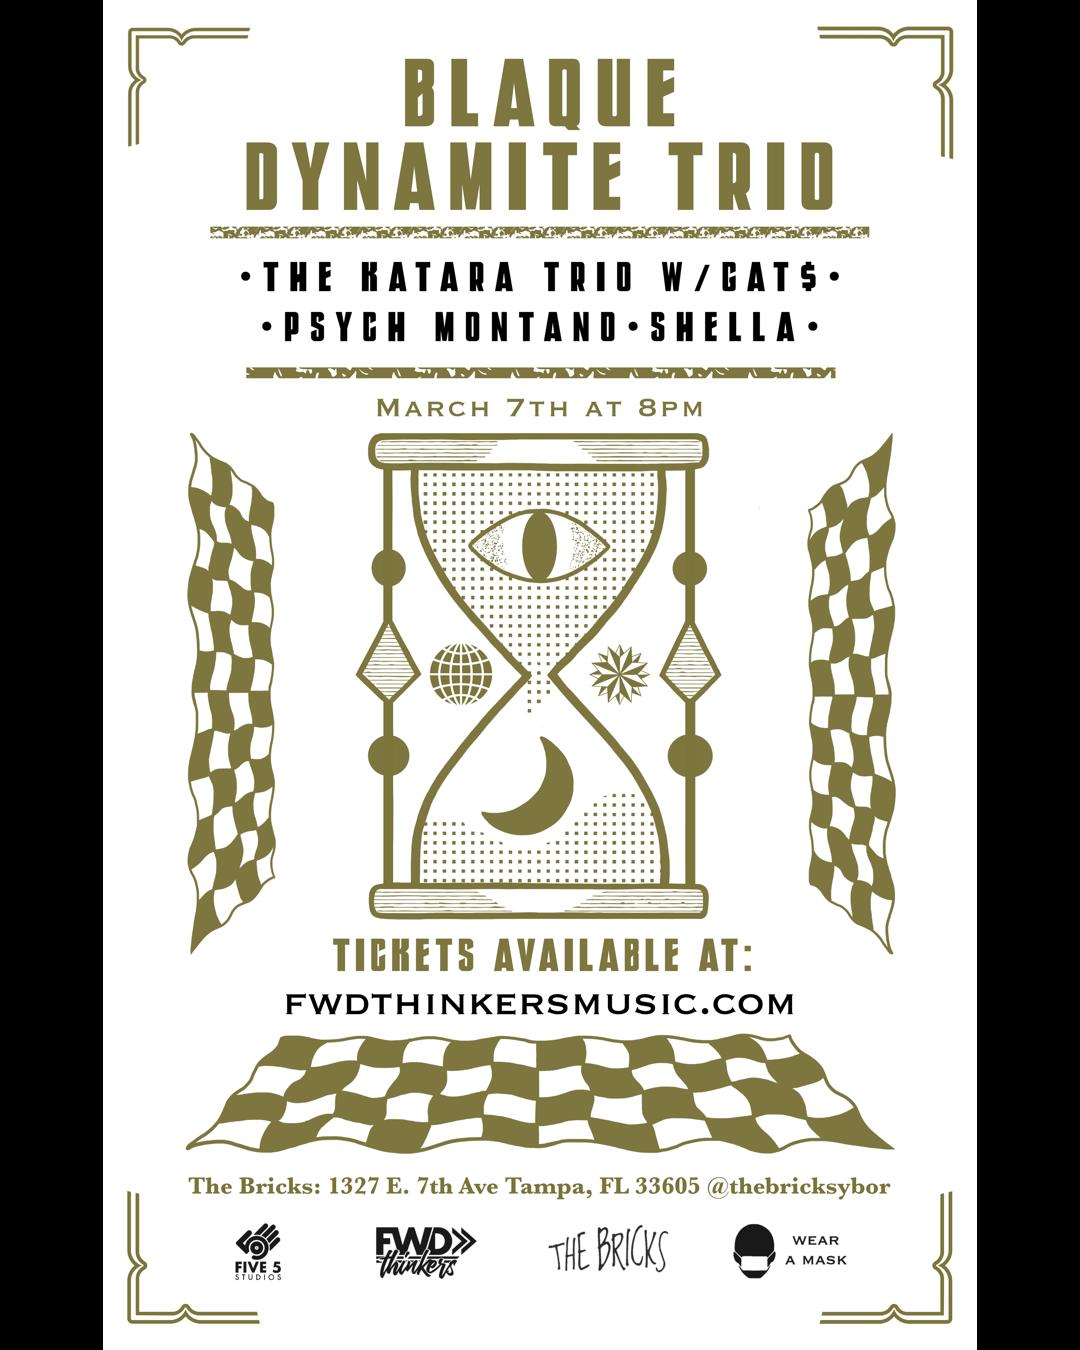 Fwdthinkers-Five5-Blaque Dynamite trio